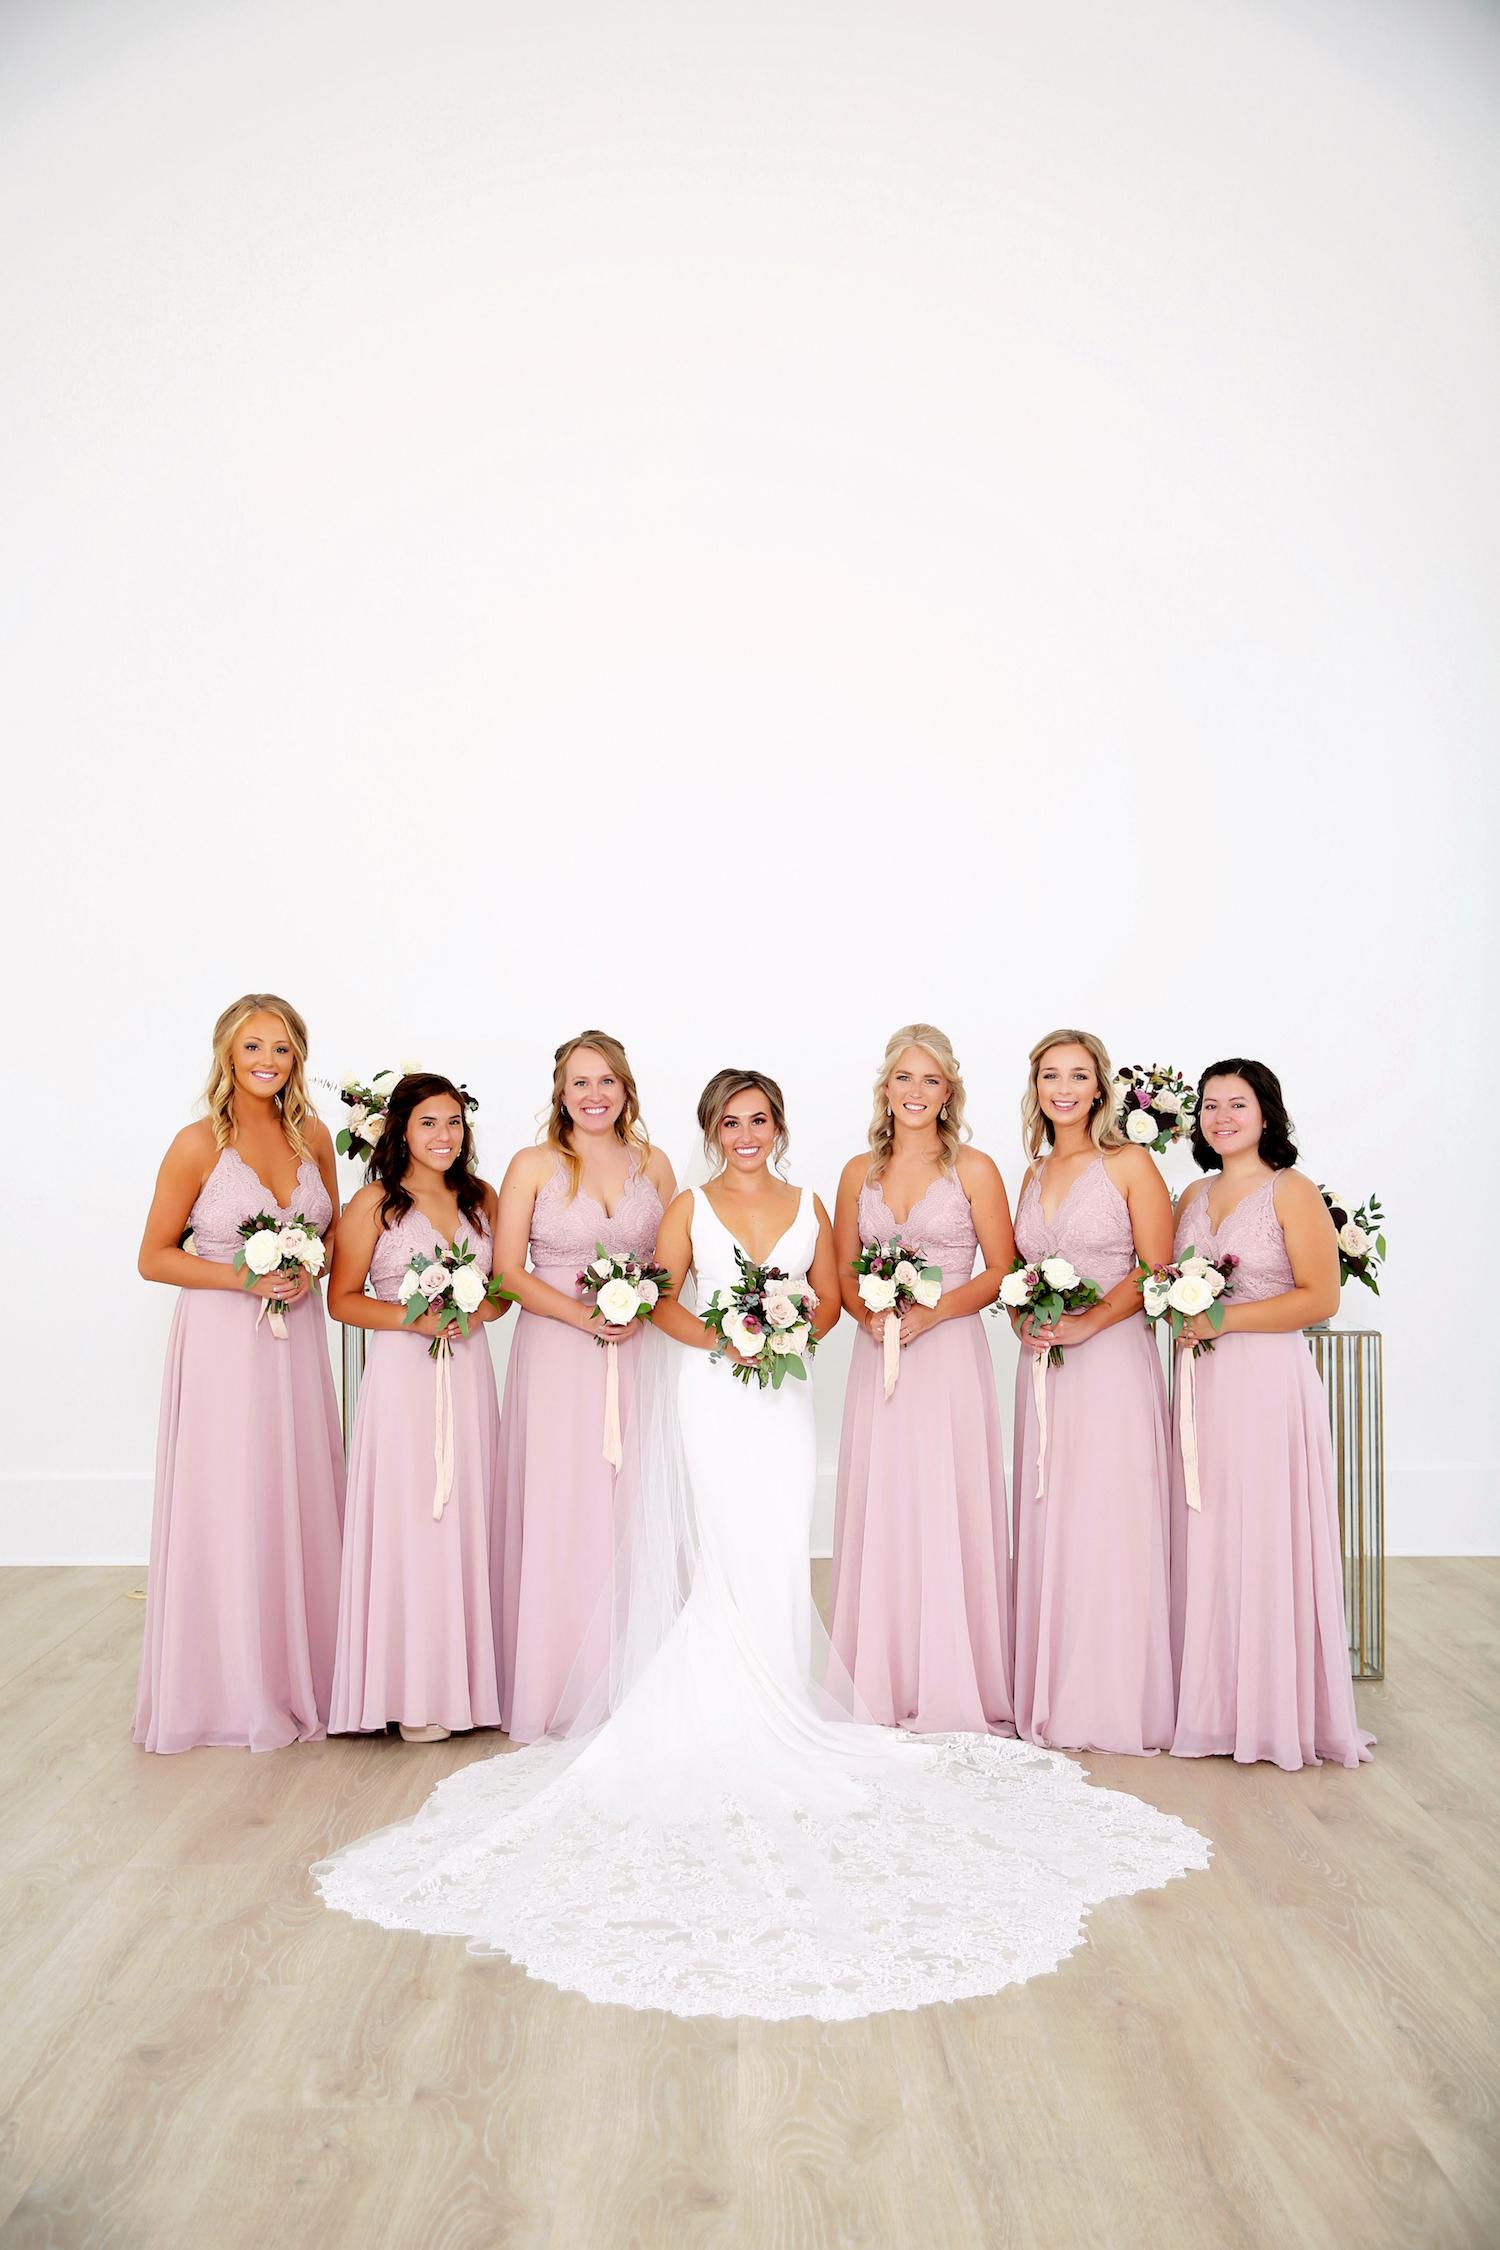 Bride standing with bridesmaids before kalamazoo michigan wedding